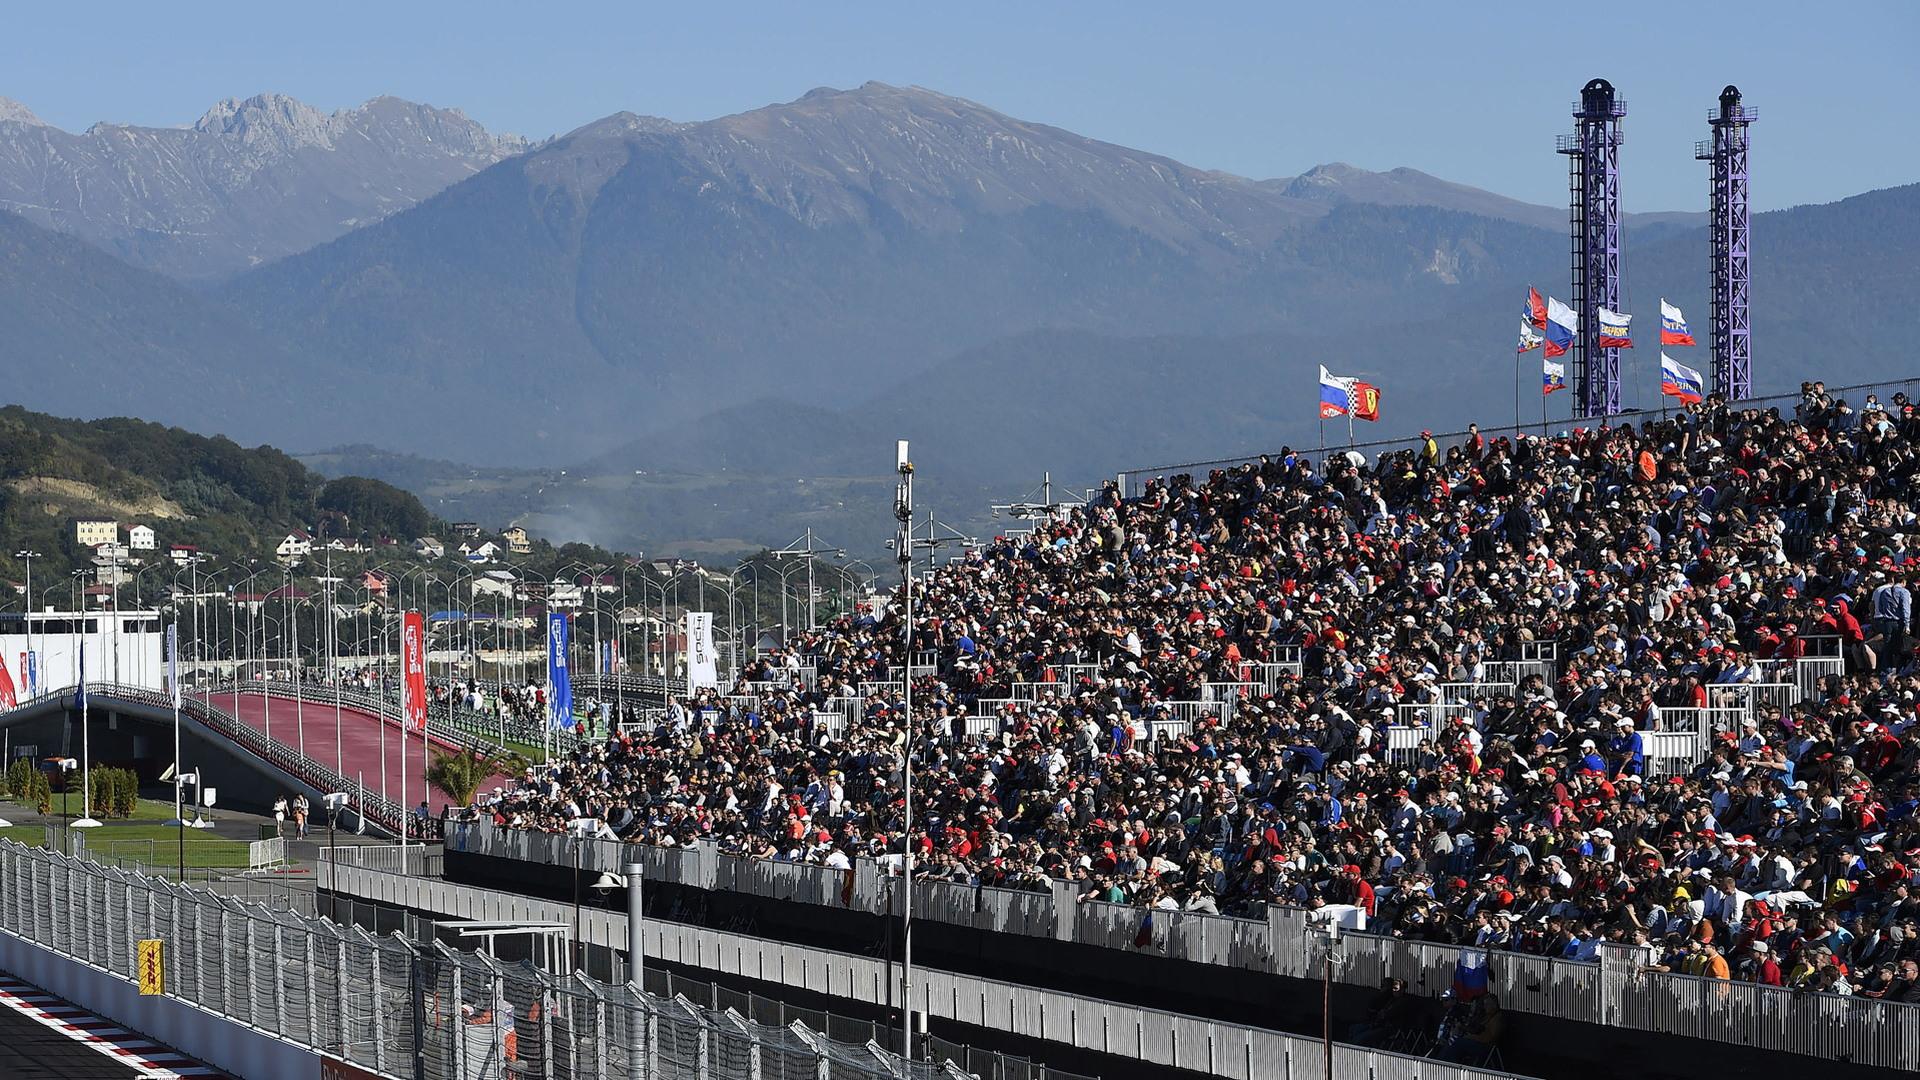 Sochi Autodrom, home of the Formula 1 Russian Grand Prix